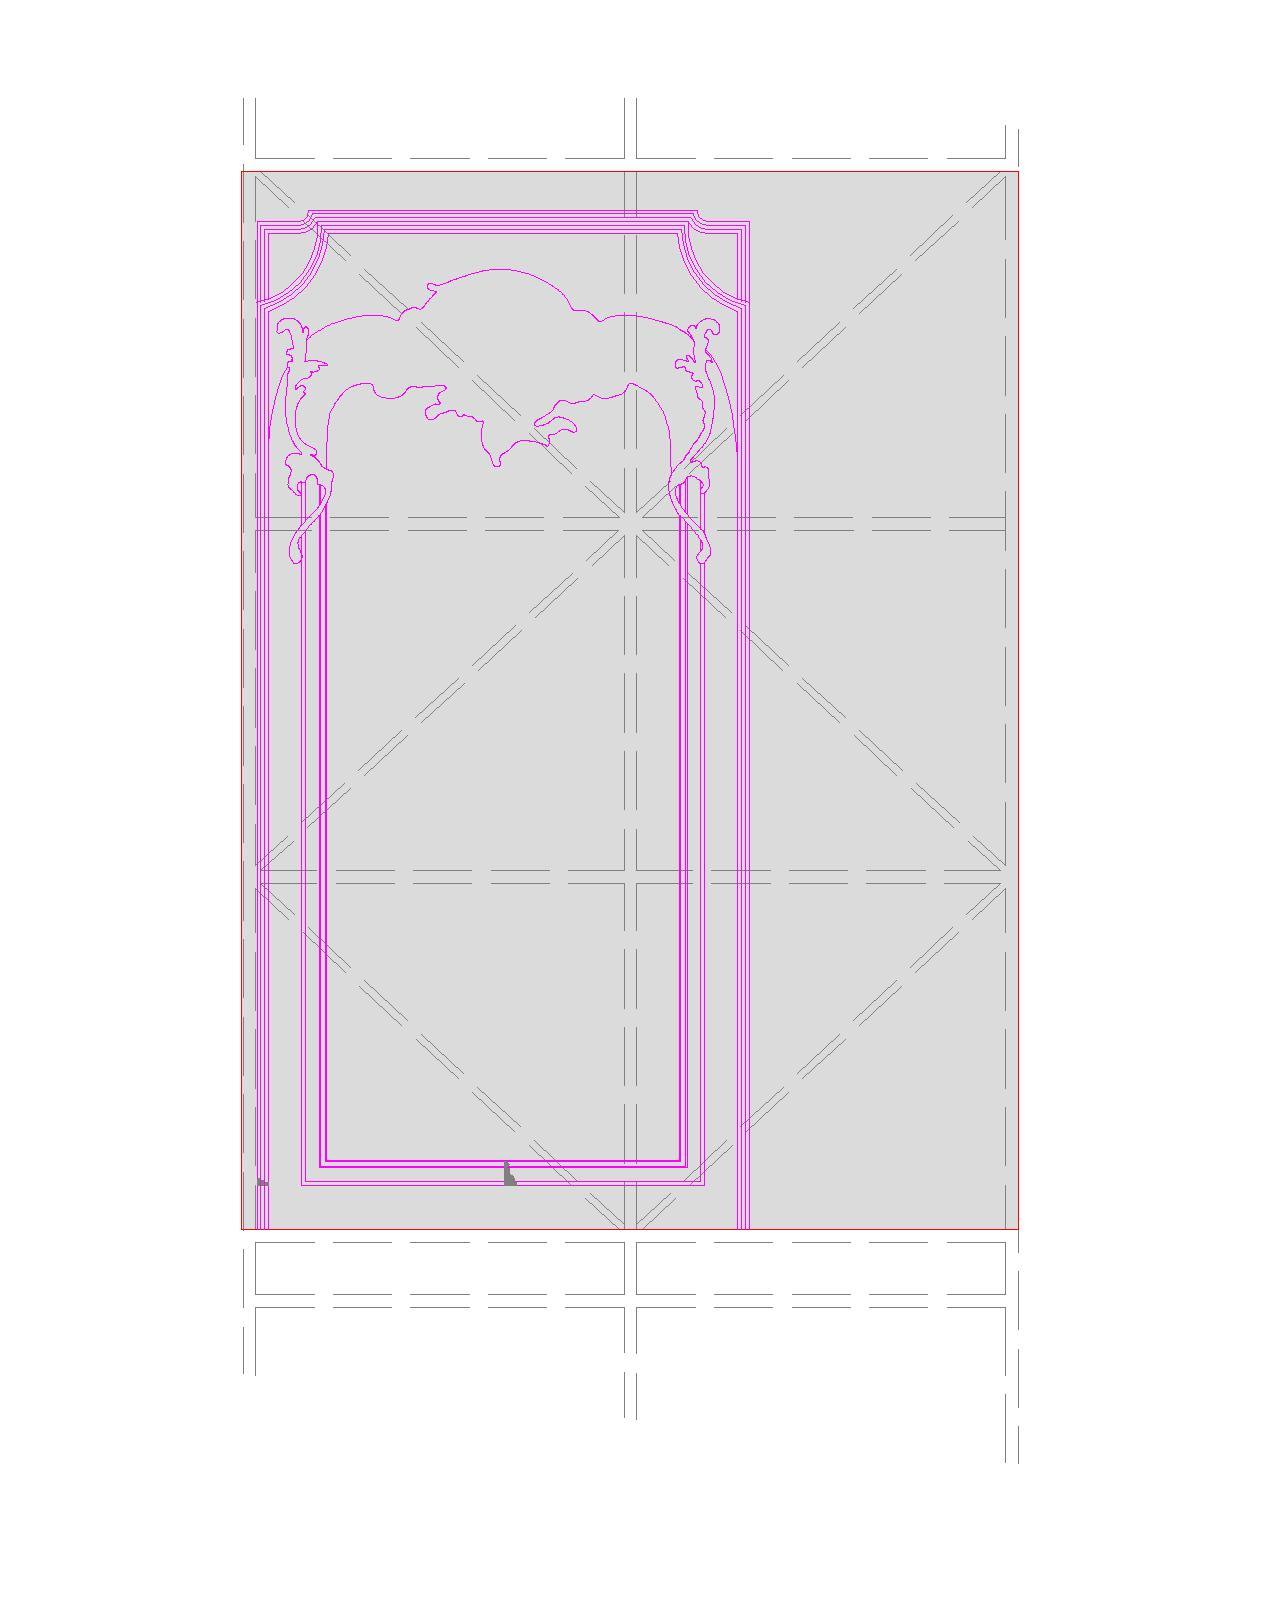 -balcony-internal-flats-layoutunfinished-model